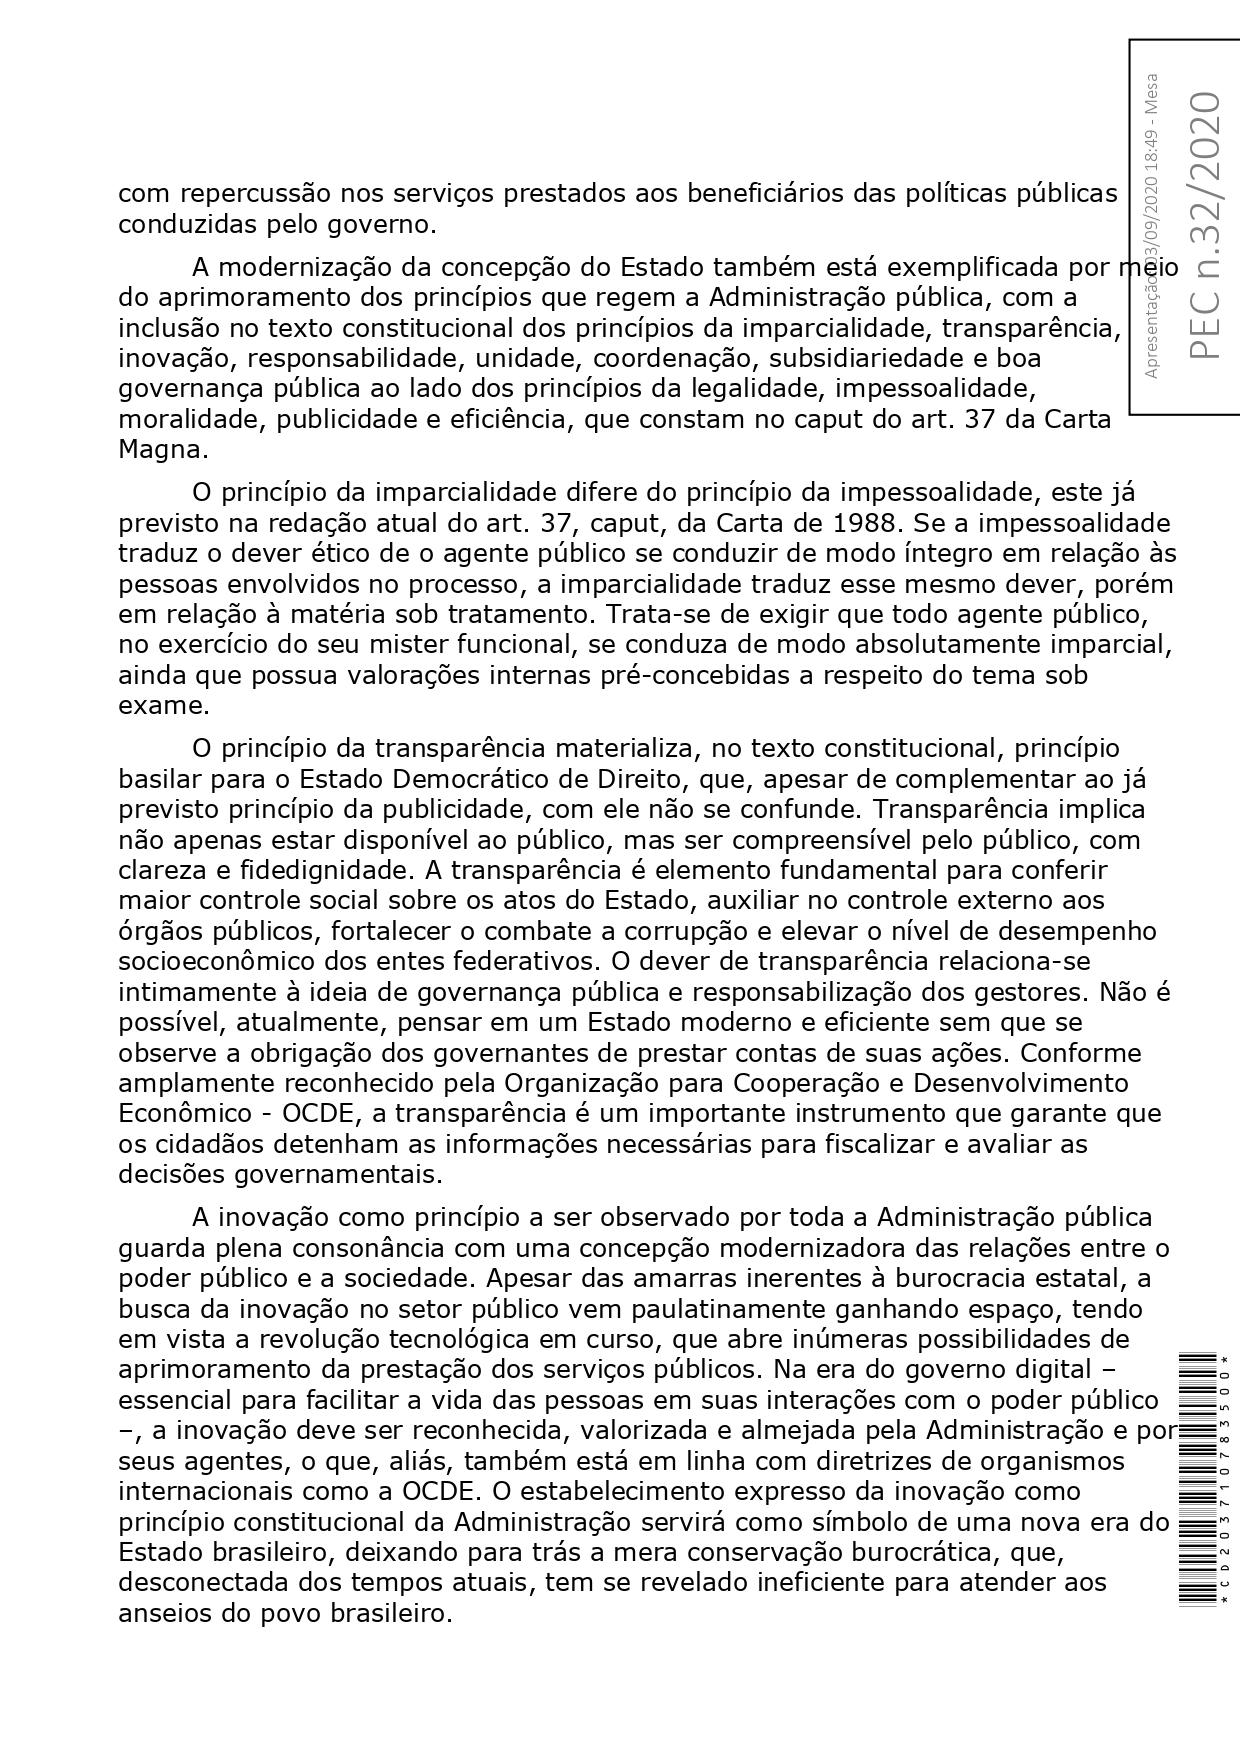 PEC-32-2020_page-0015.jpg